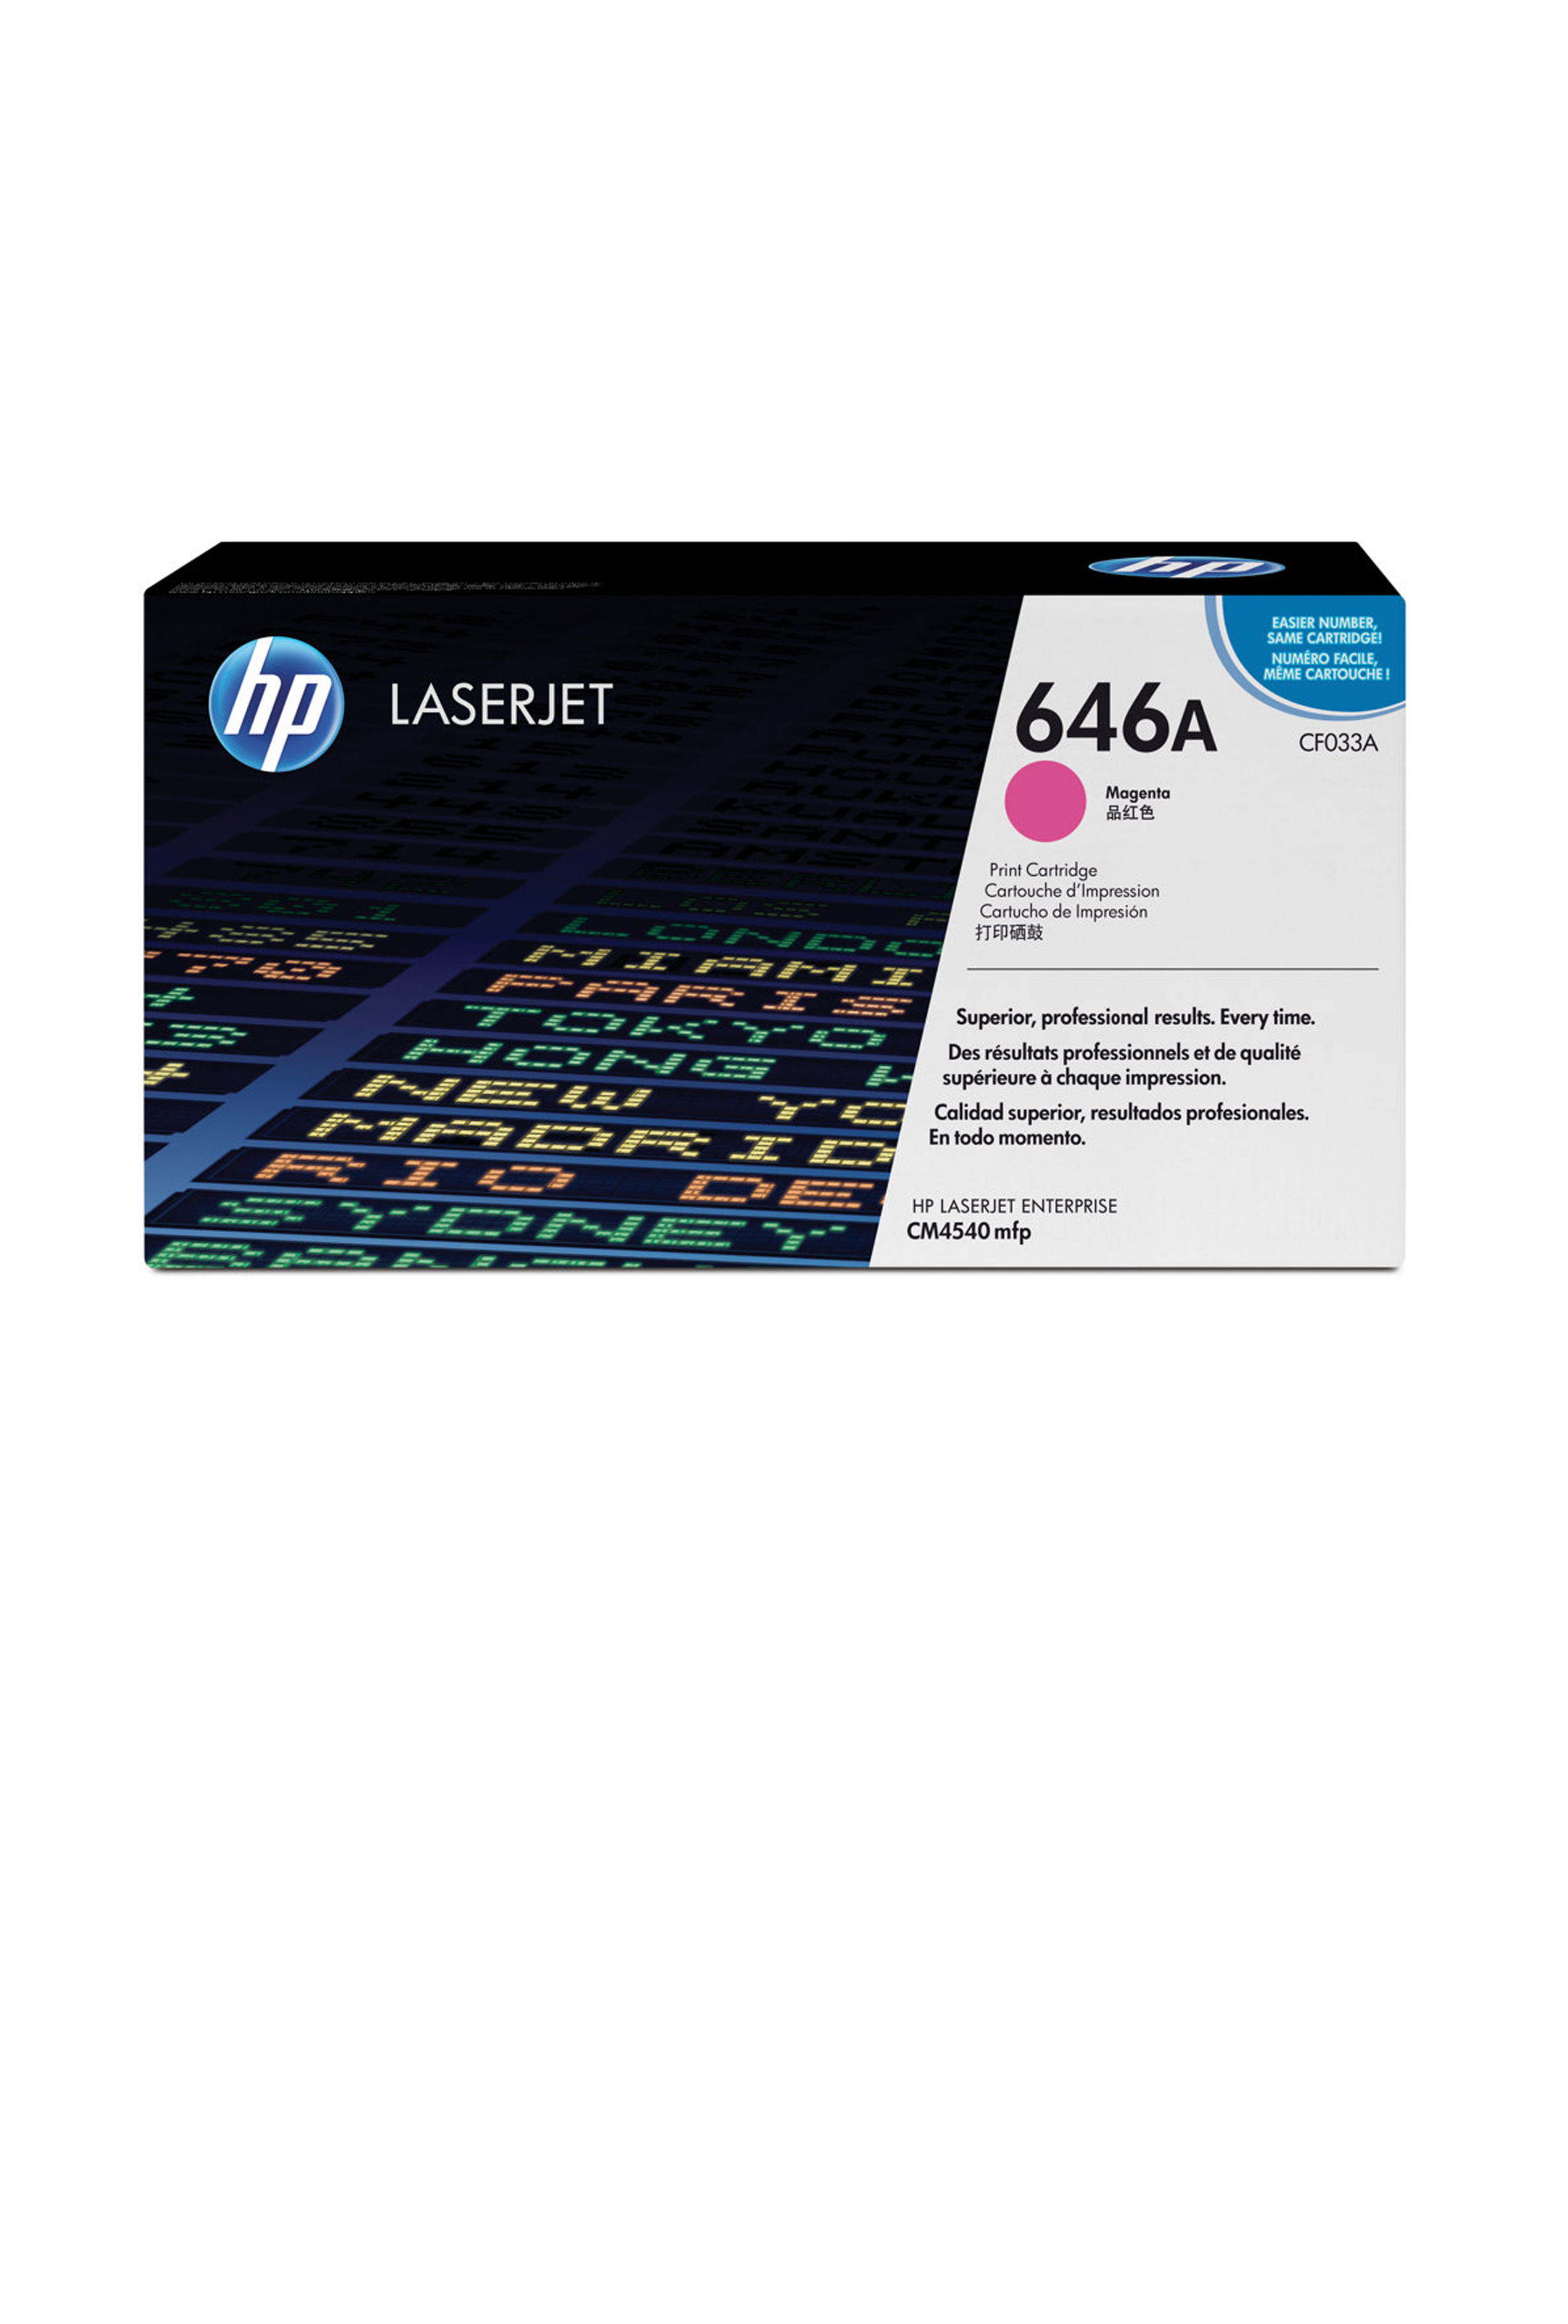 HP Laserjet Print cartridge Magenta (CF033AC)